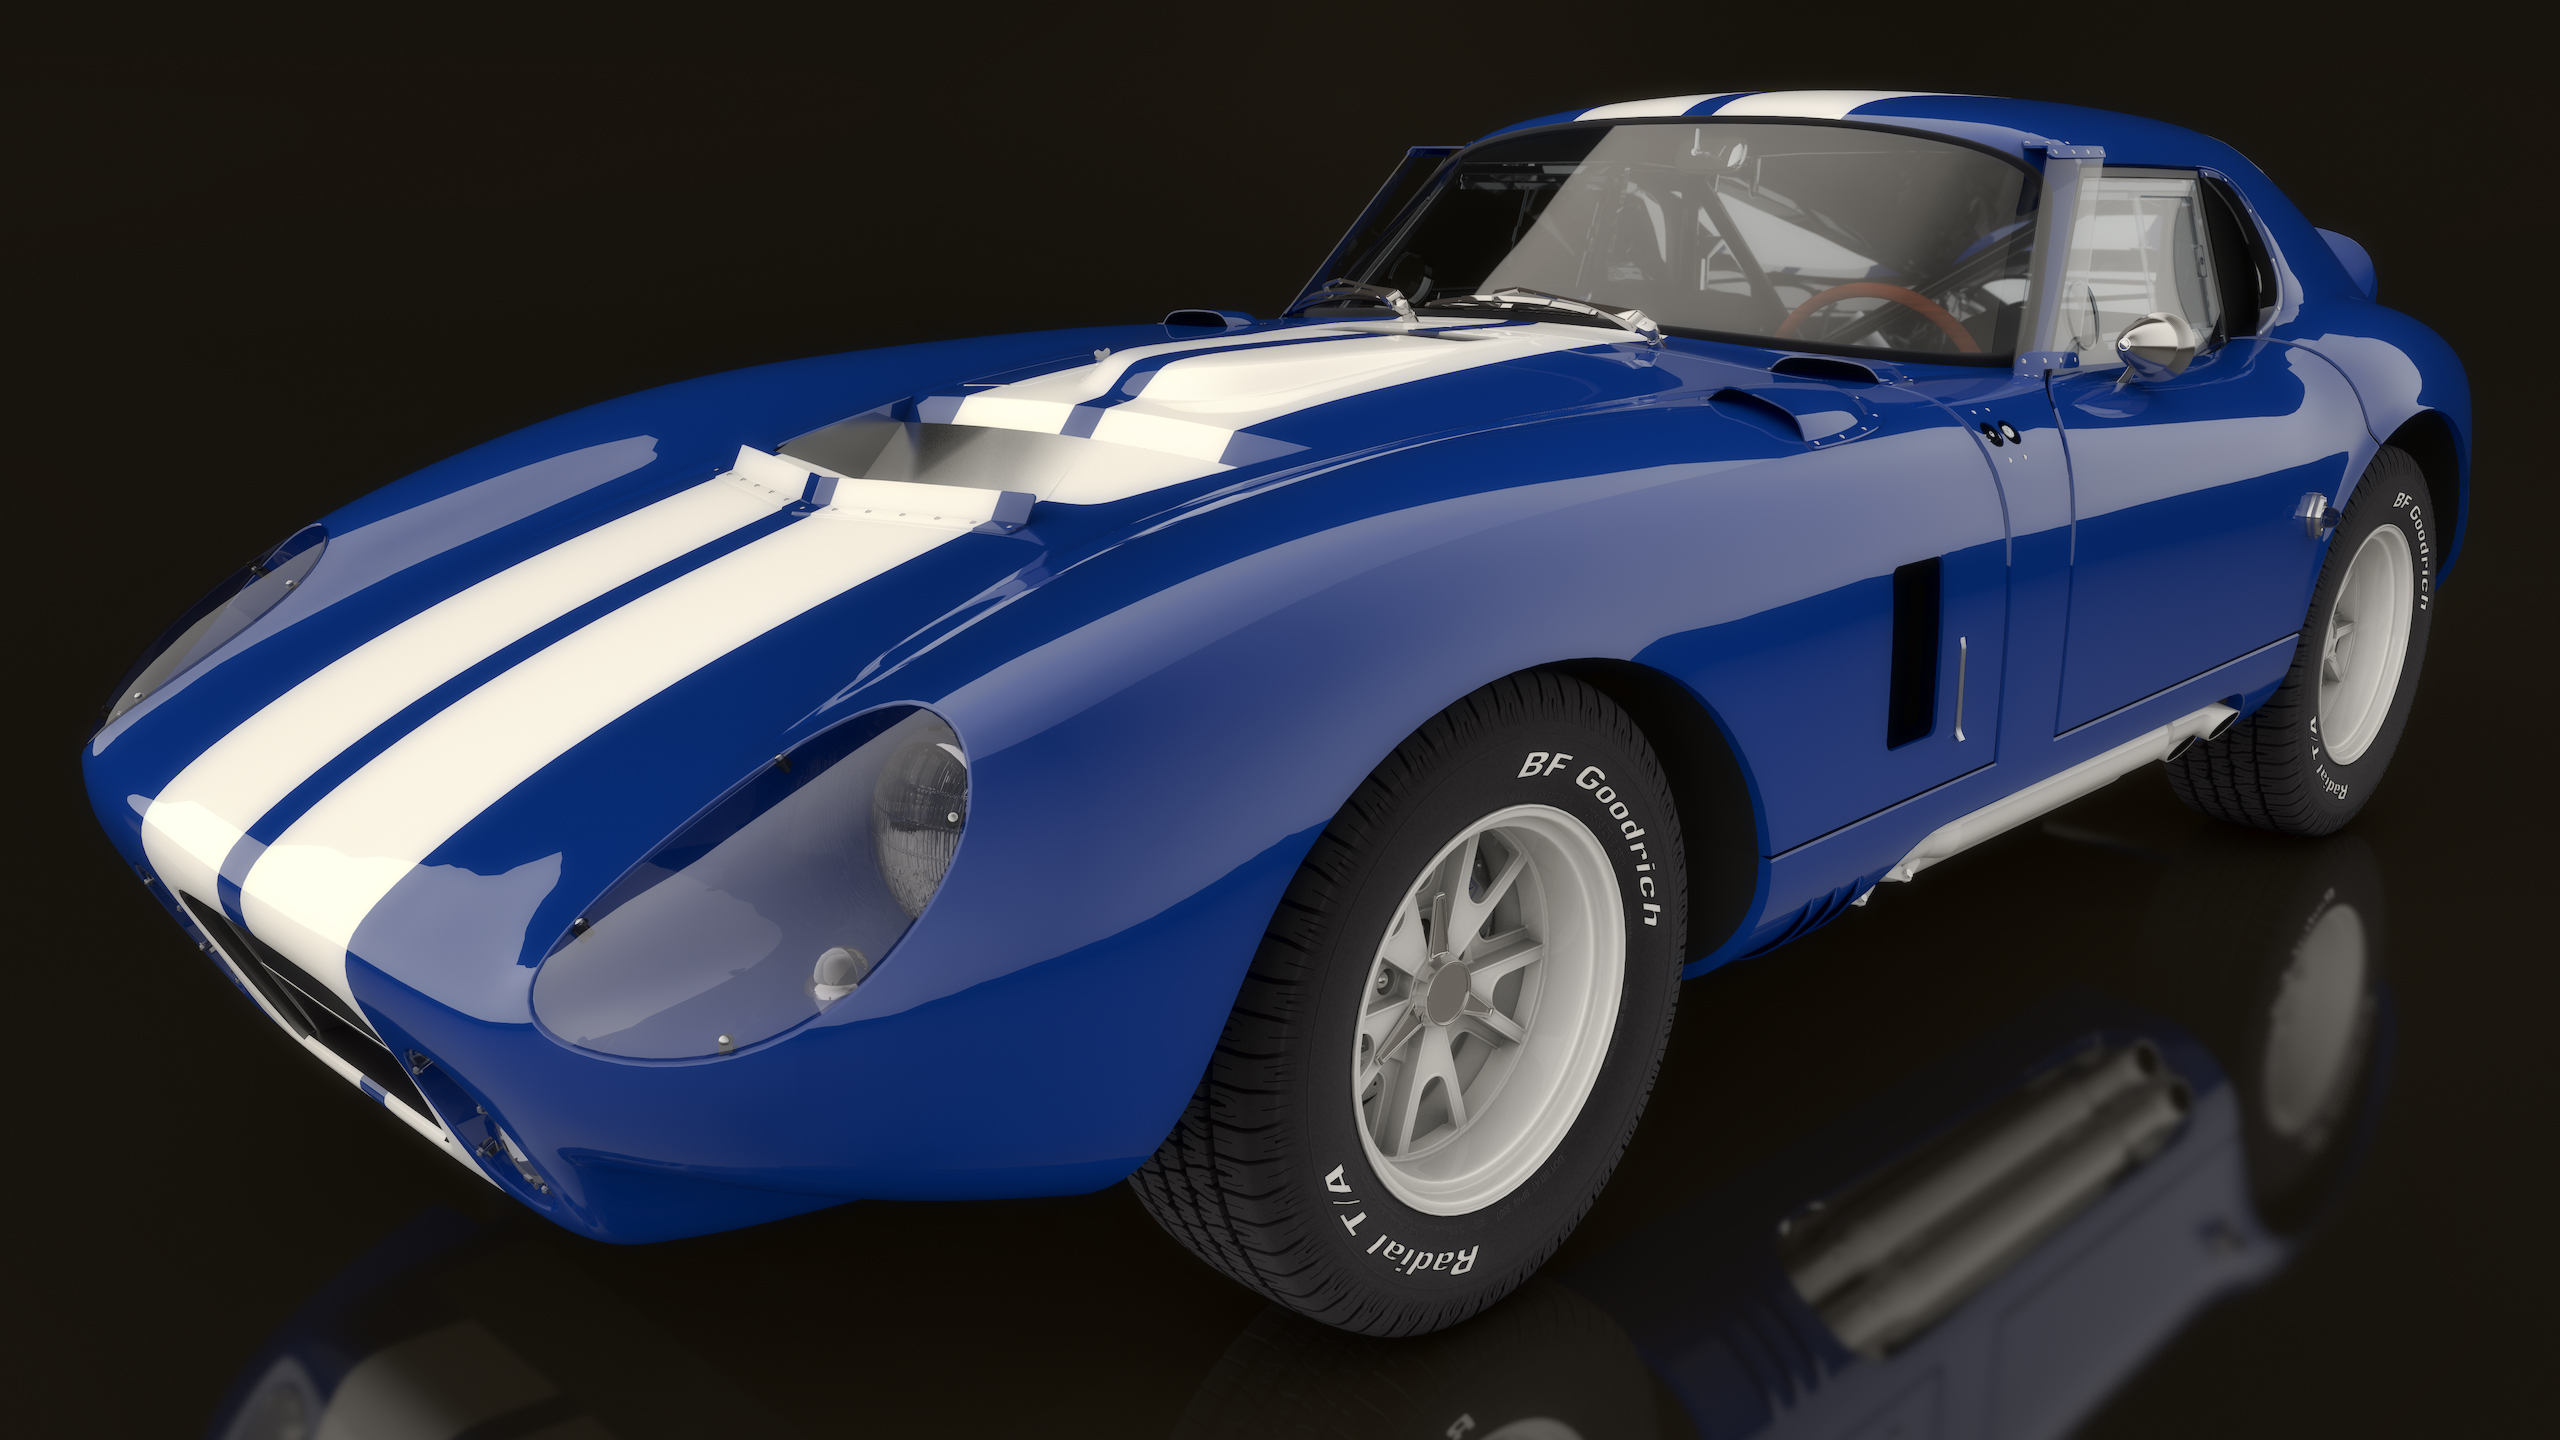 1965 Shelby Cobra Daytona by SamCurry